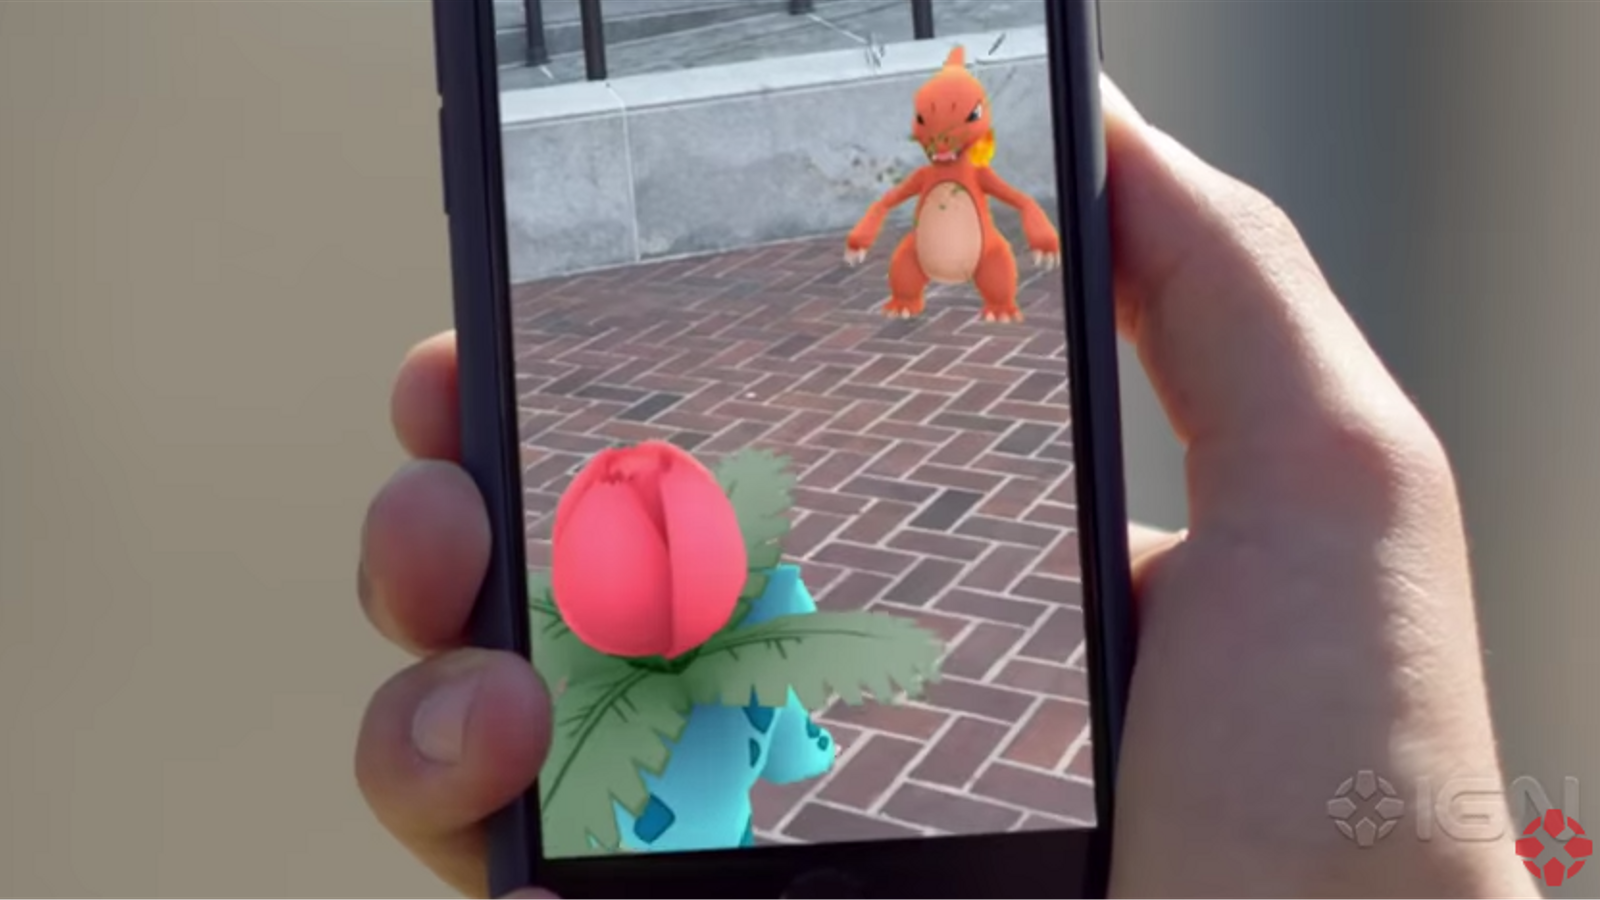 El tràiler de Pokémon Go